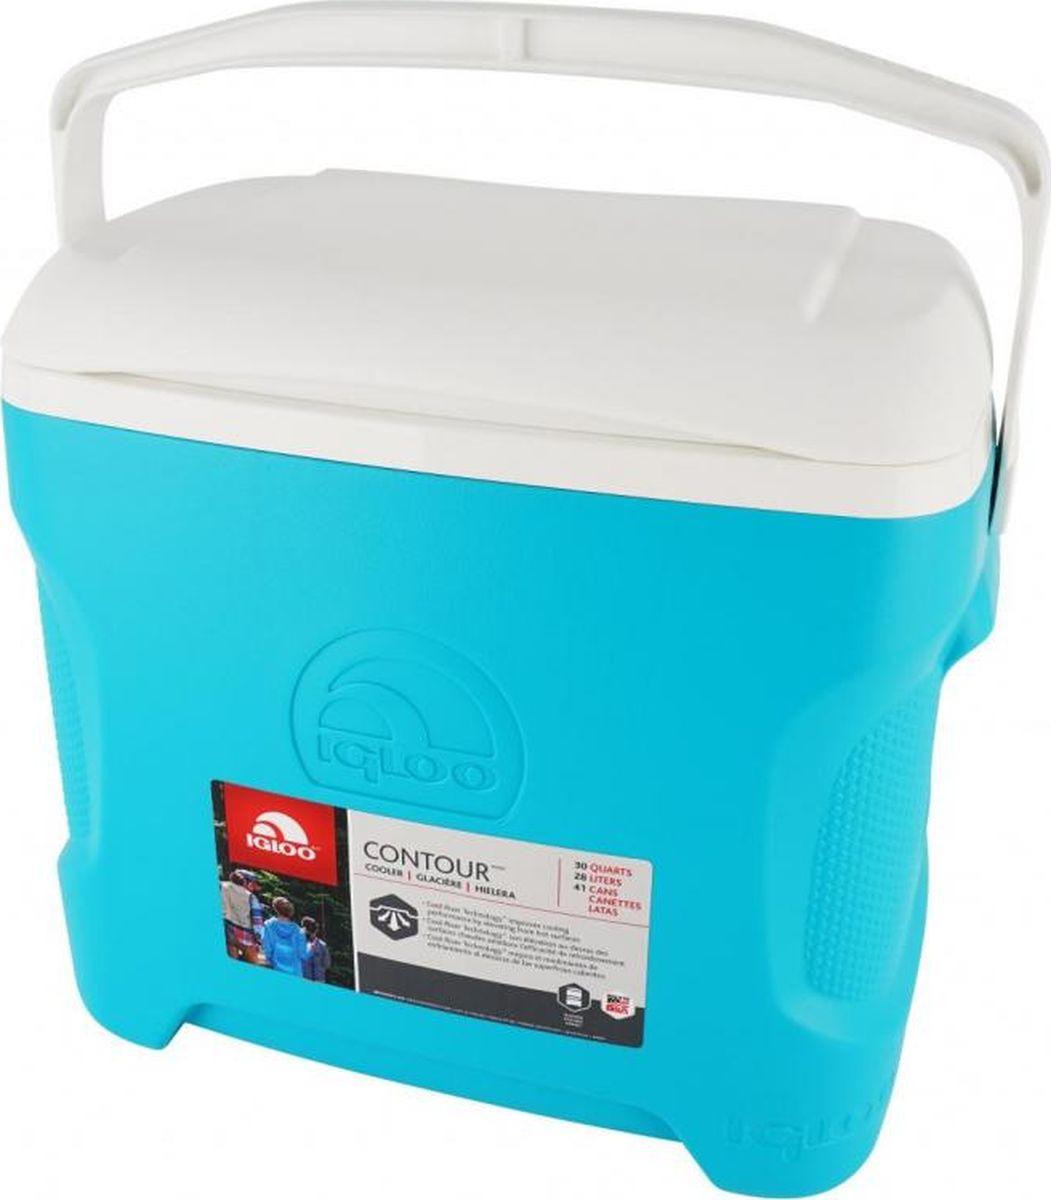 Изотермический контейнер Igloo Contour, 00049832, голубой, 47 х 34 х 43 см igloo изотермический контейнер igloo playmate pal jucetwh